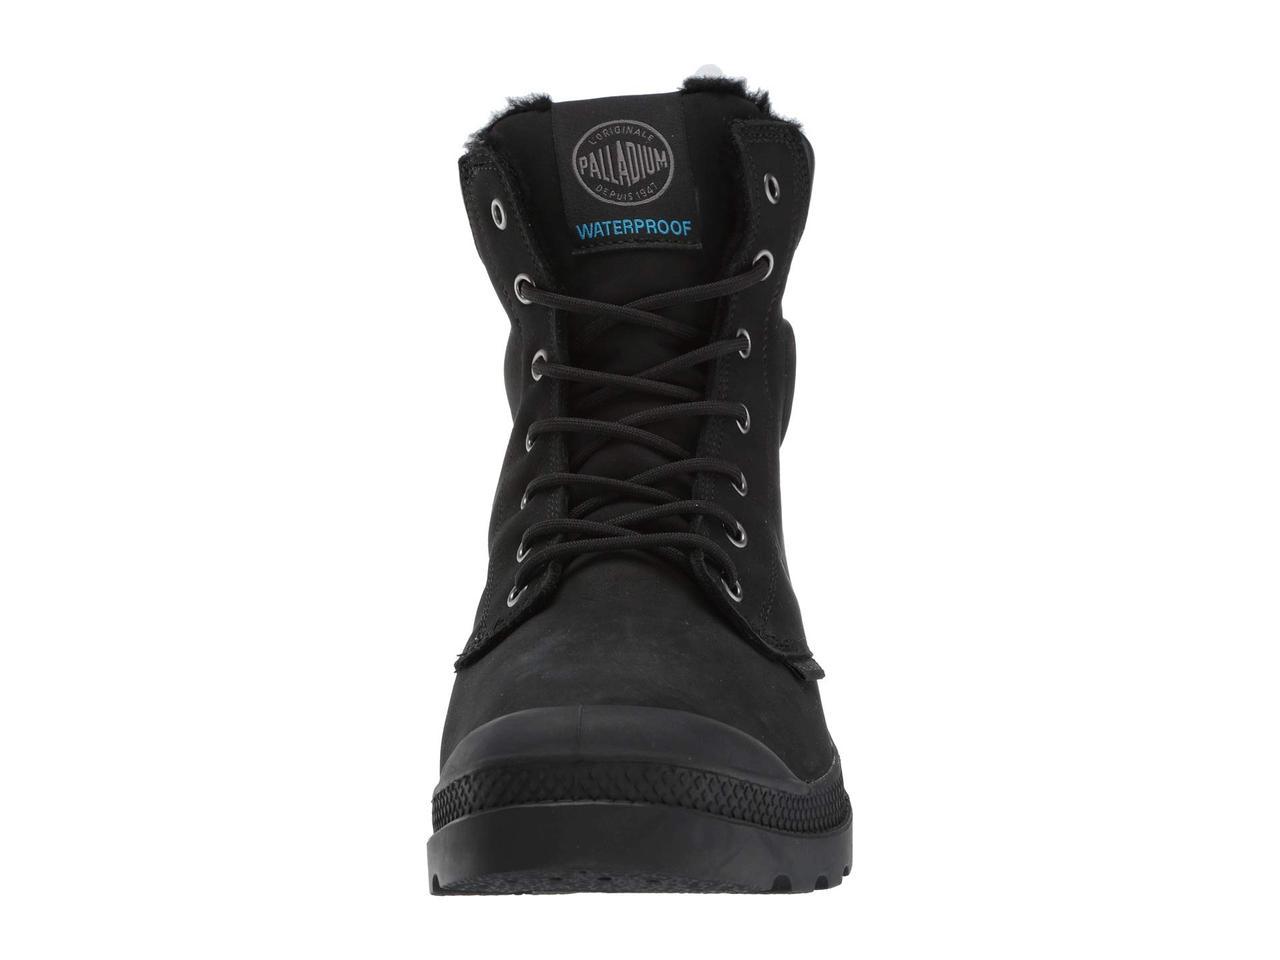 Ботинки Сапоги (Оригинал) Palladium Pampa Sport Cuff WPS Black Black ... e6164a04777e2